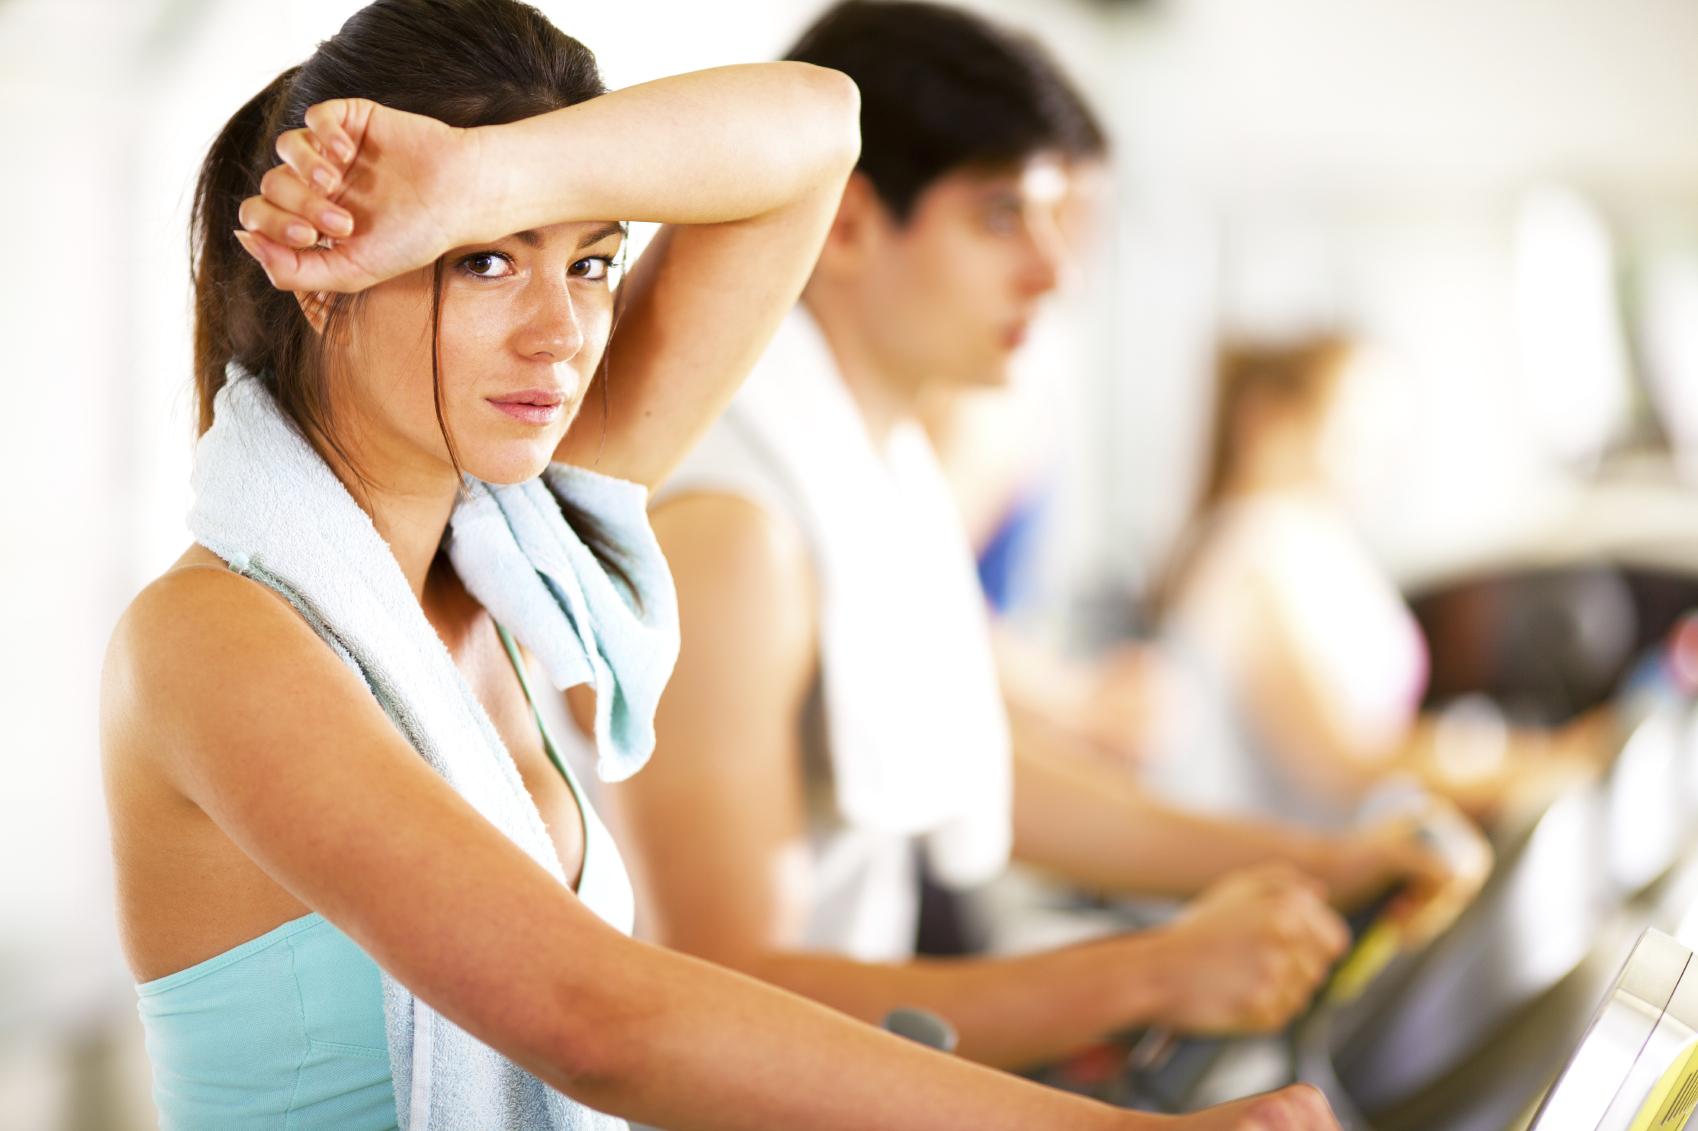 Sweaty Photographs of Perspiration - Stockvault.net Blog